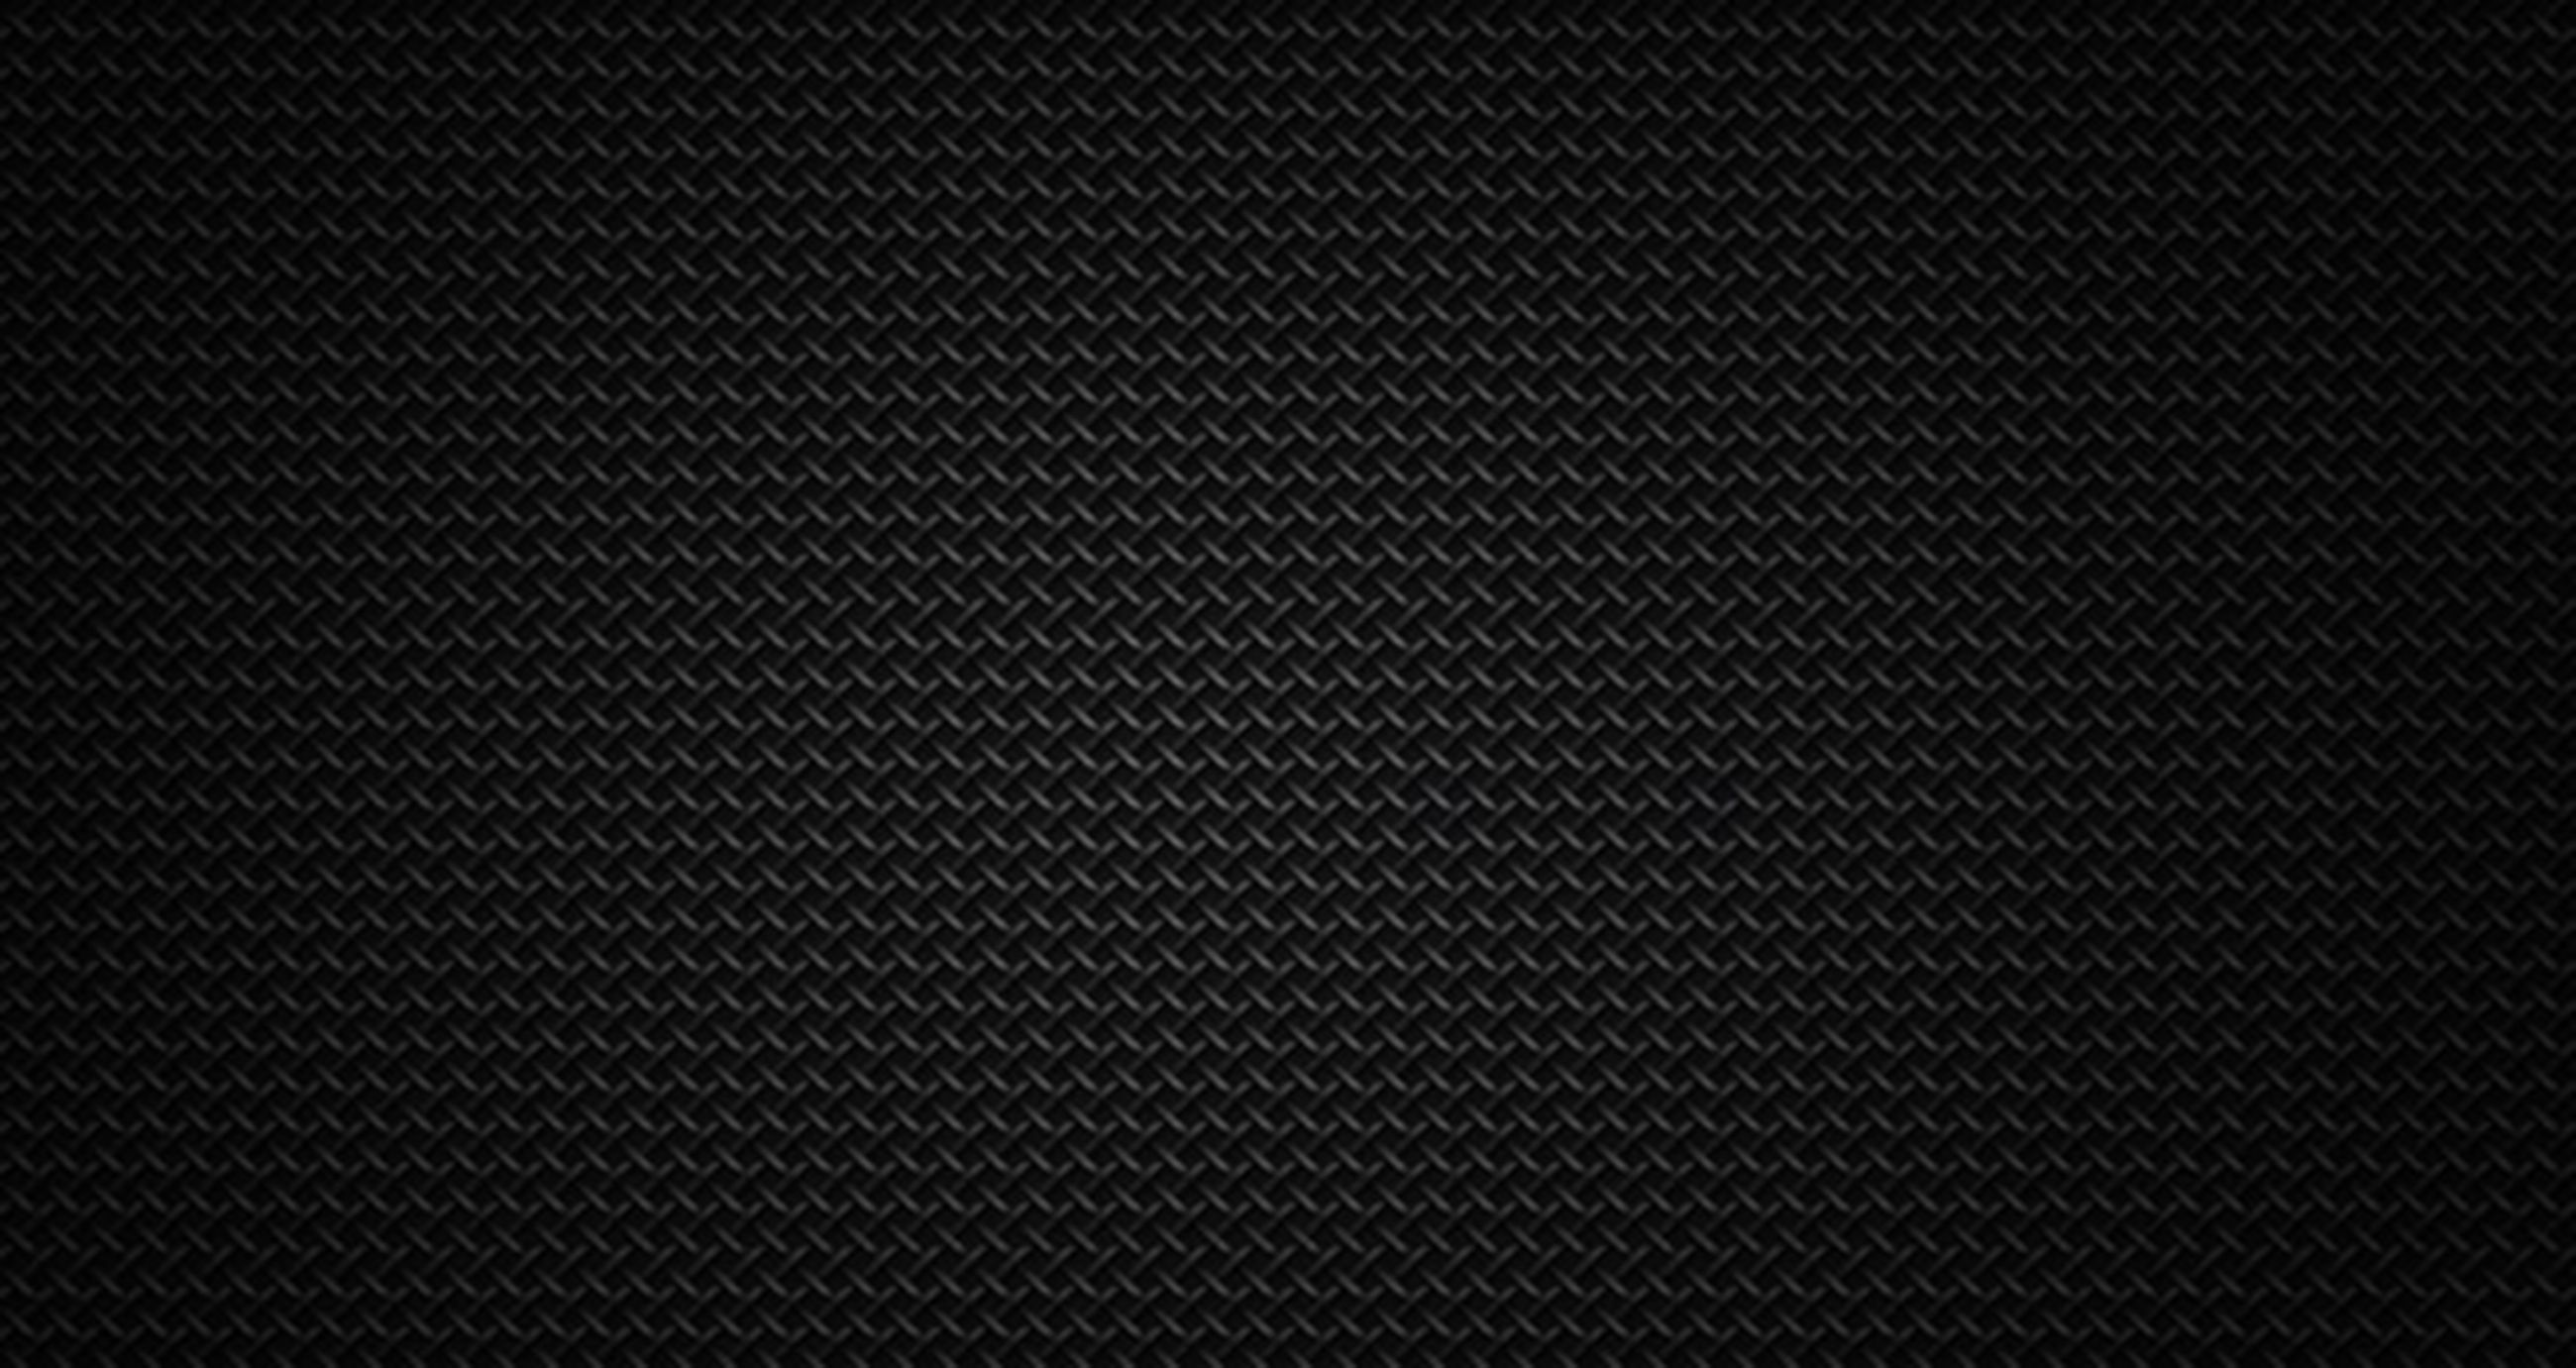 Black Carbon Fiber Wallpapers Top Free Black Carbon Fiber Backgrounds Wallpaperaccess